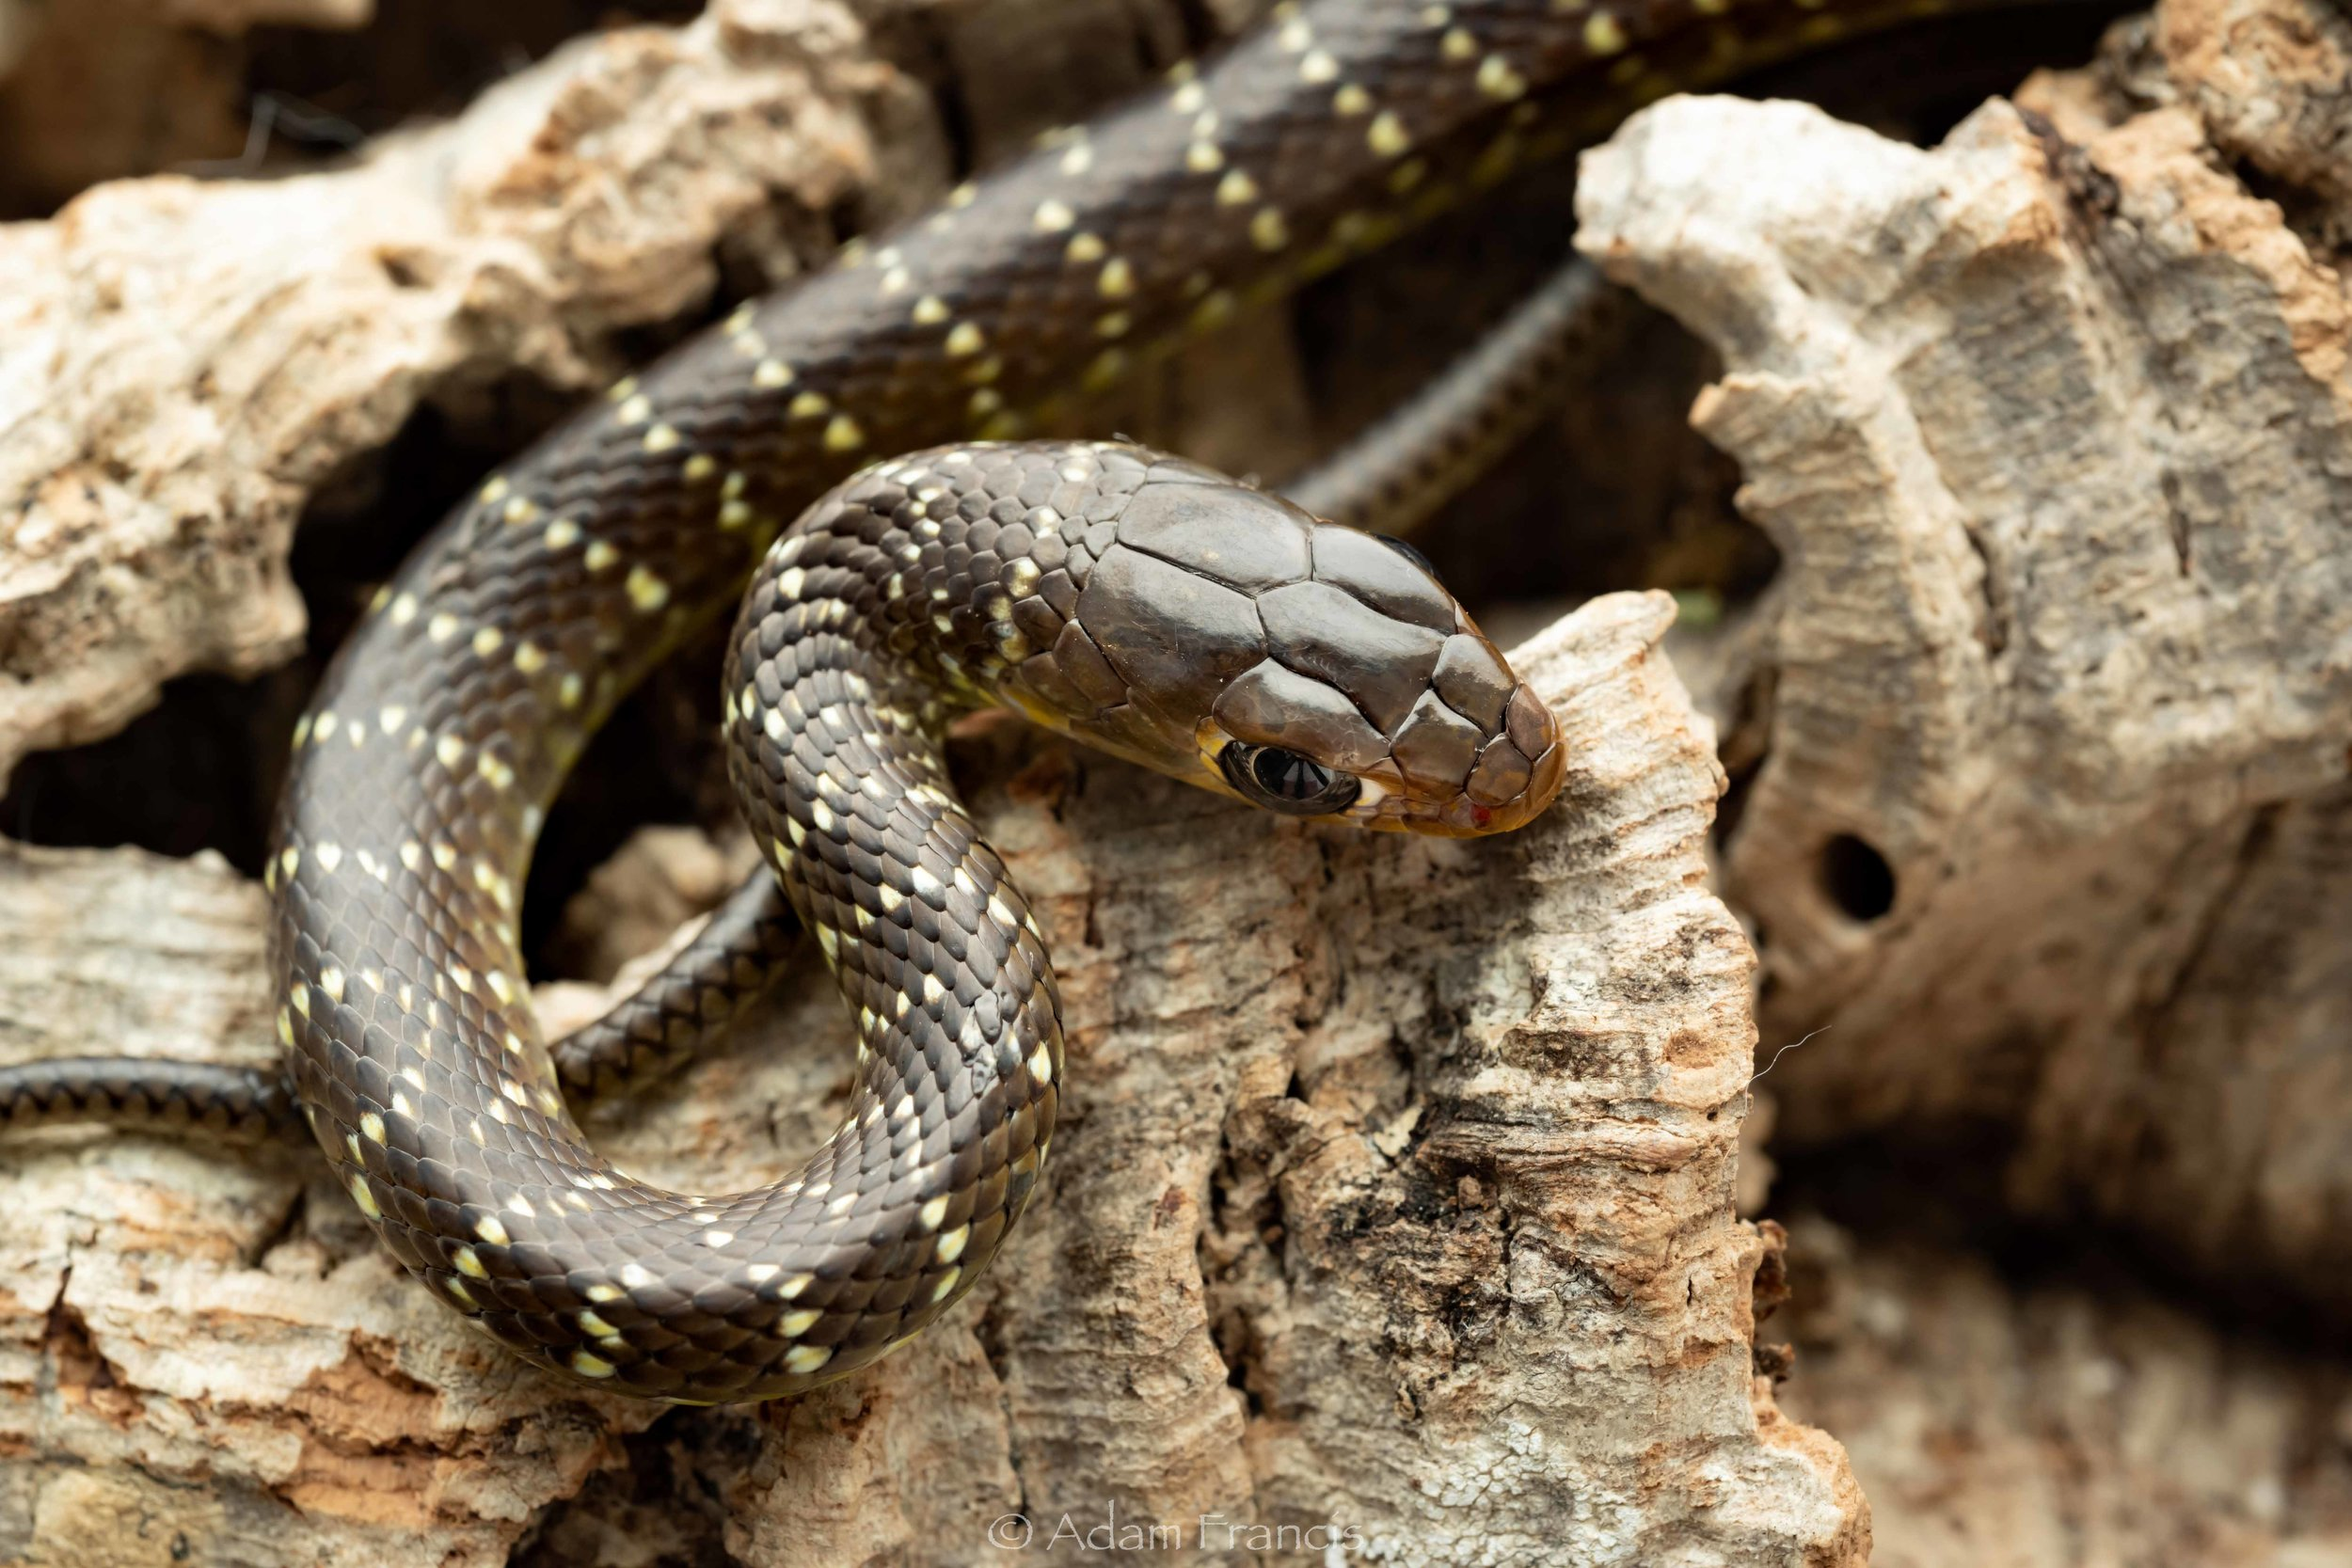 Indo Chinese Rat Snake - Ptyas korros